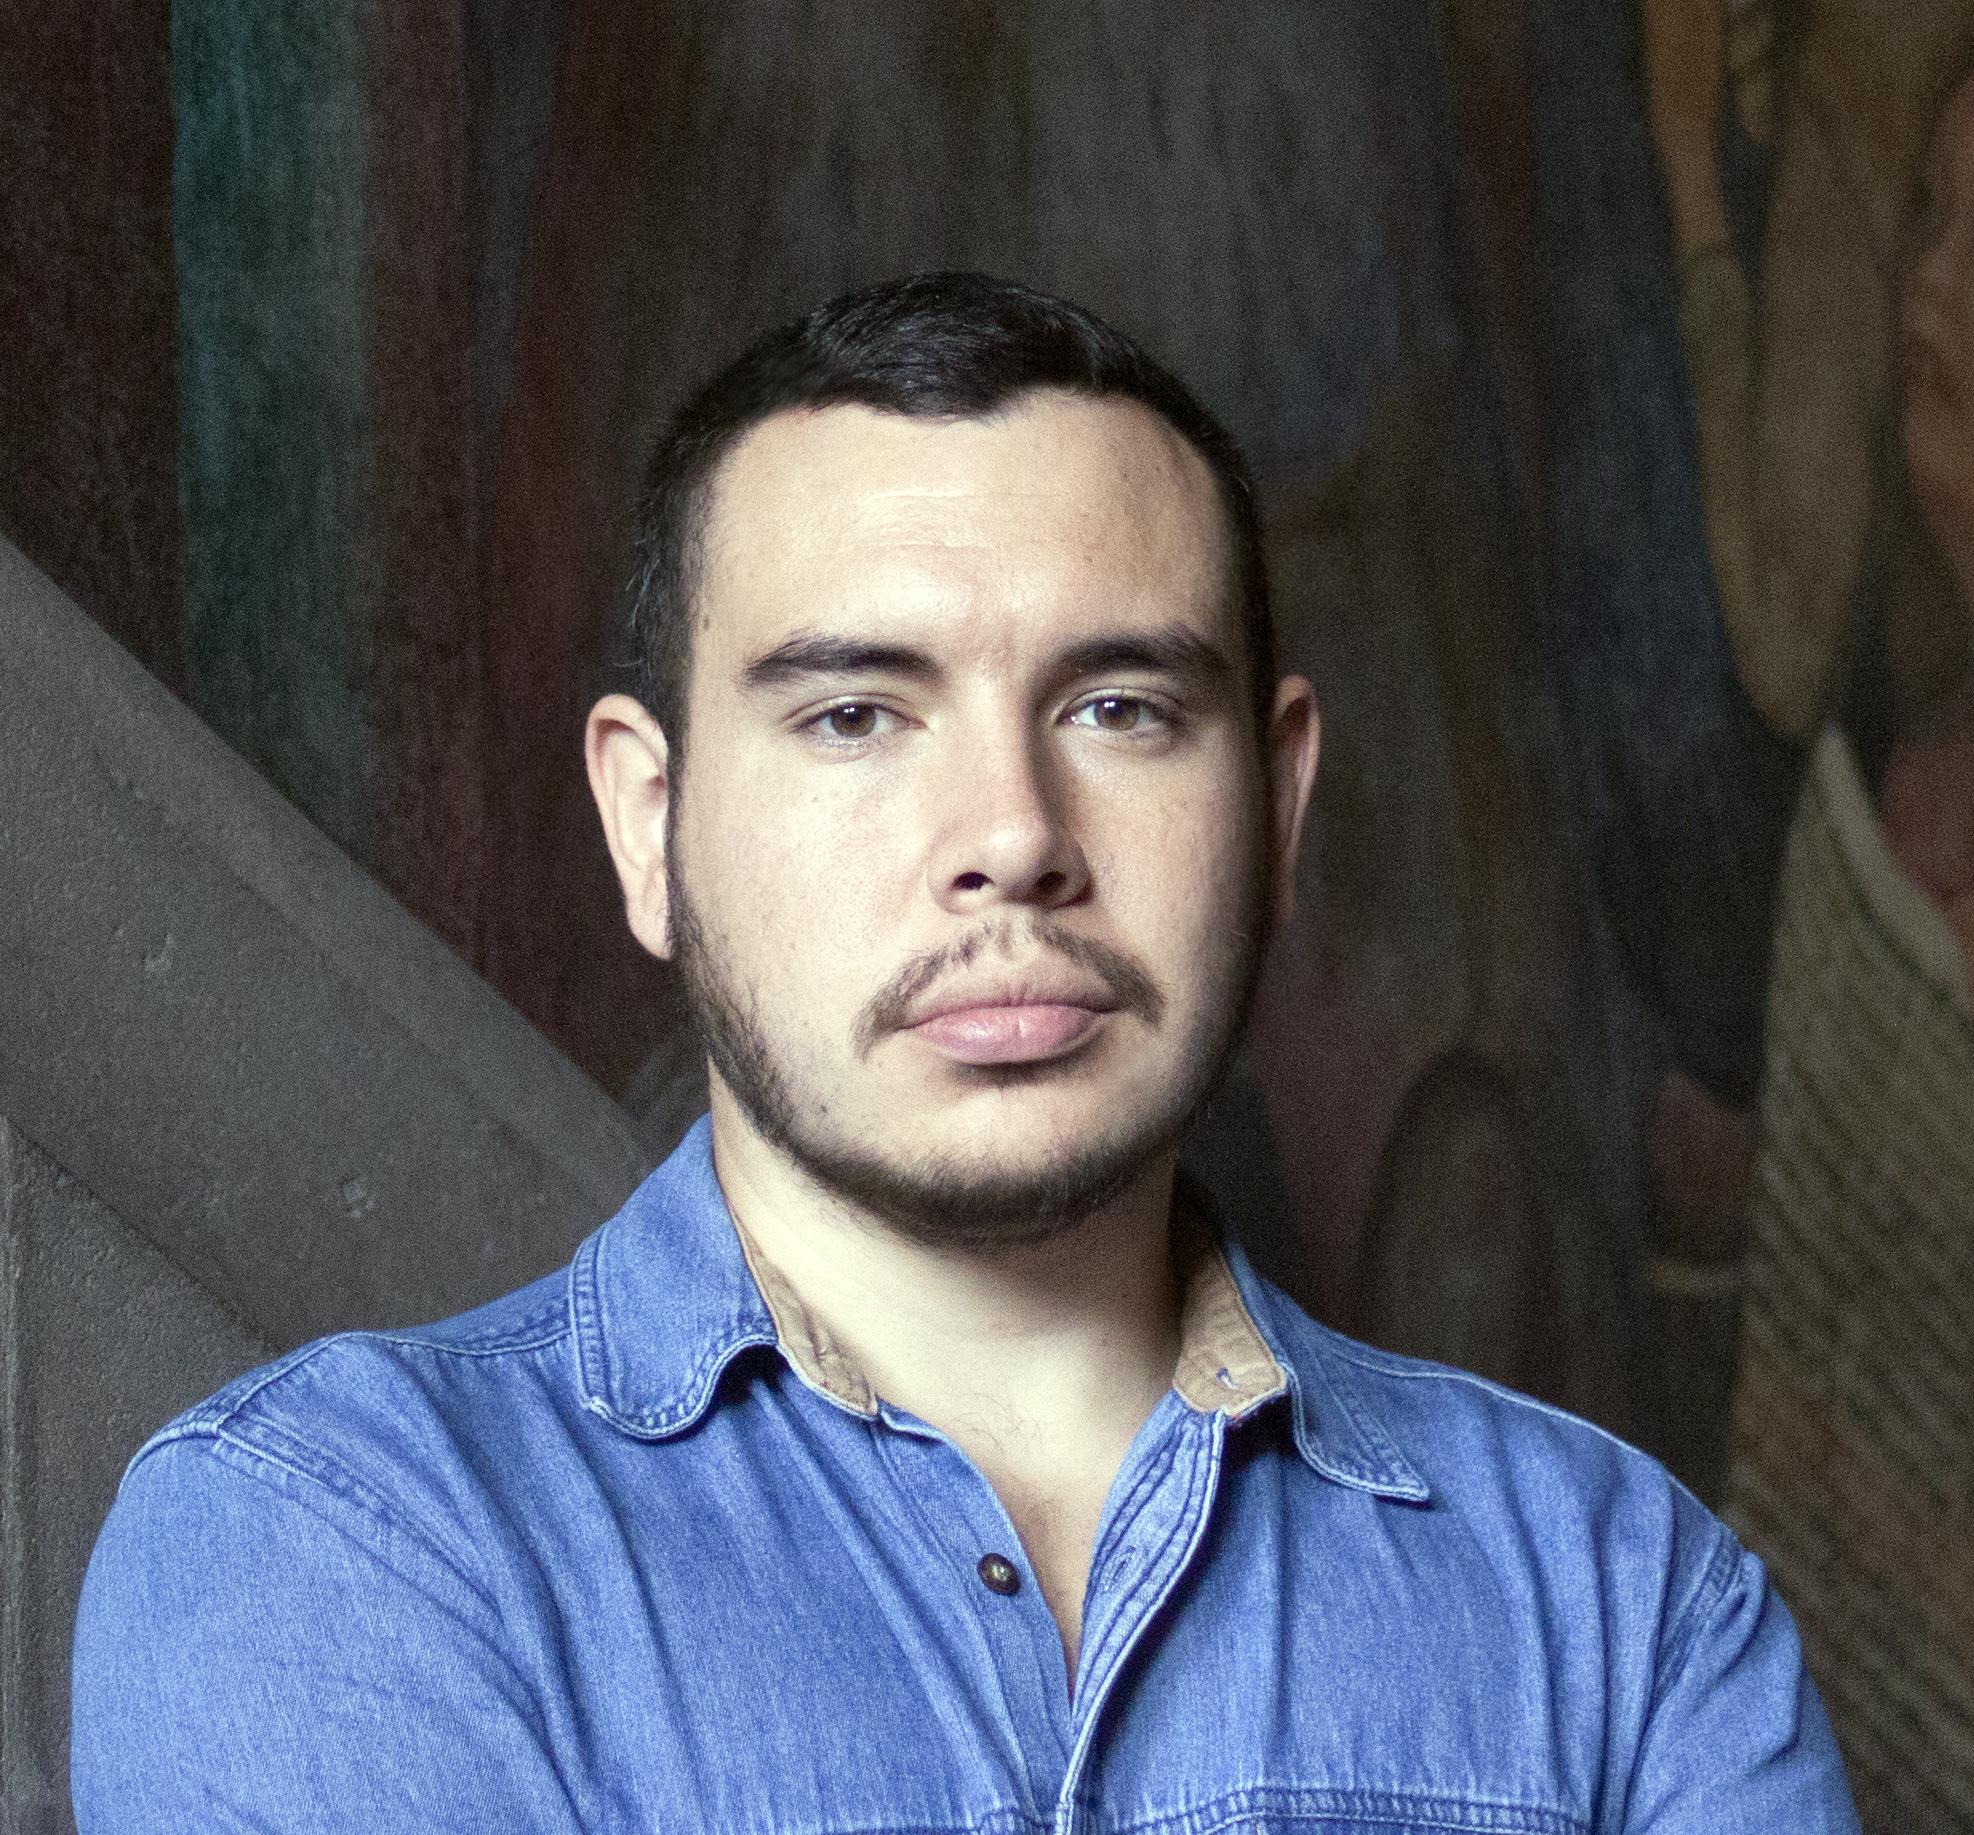 John Paul Brammer is a Chicano freelance journalist living in New York City.